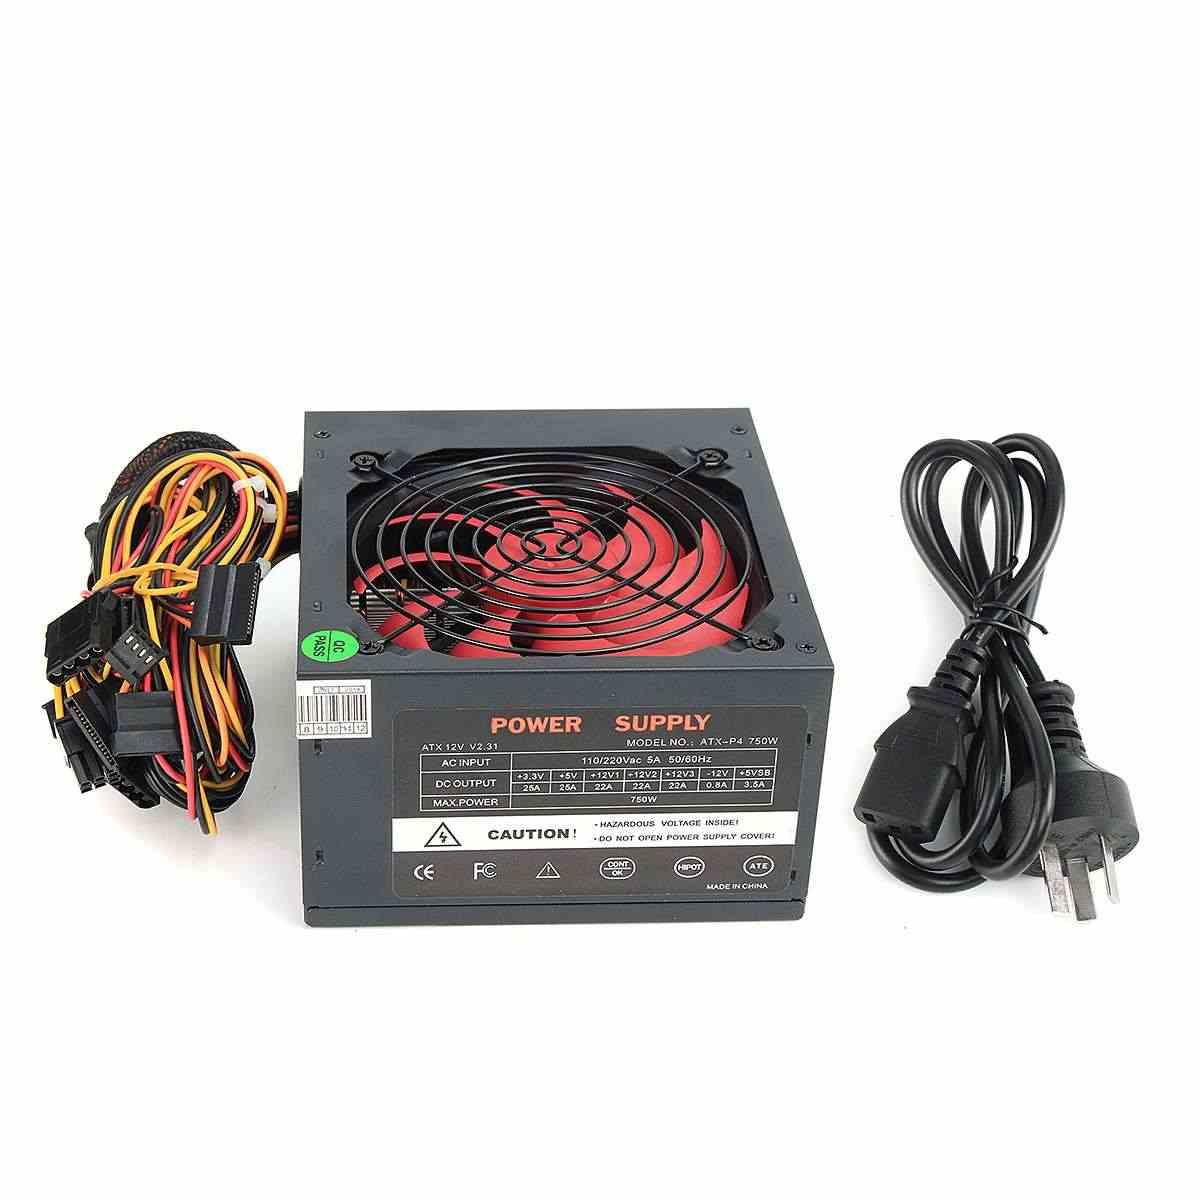 750W PSU ATX 12V Gaming PC Power Supply 24Pin / PCI /SATA /ATX  700 Walt 12CM Fan New Computer Power Supply For BTC